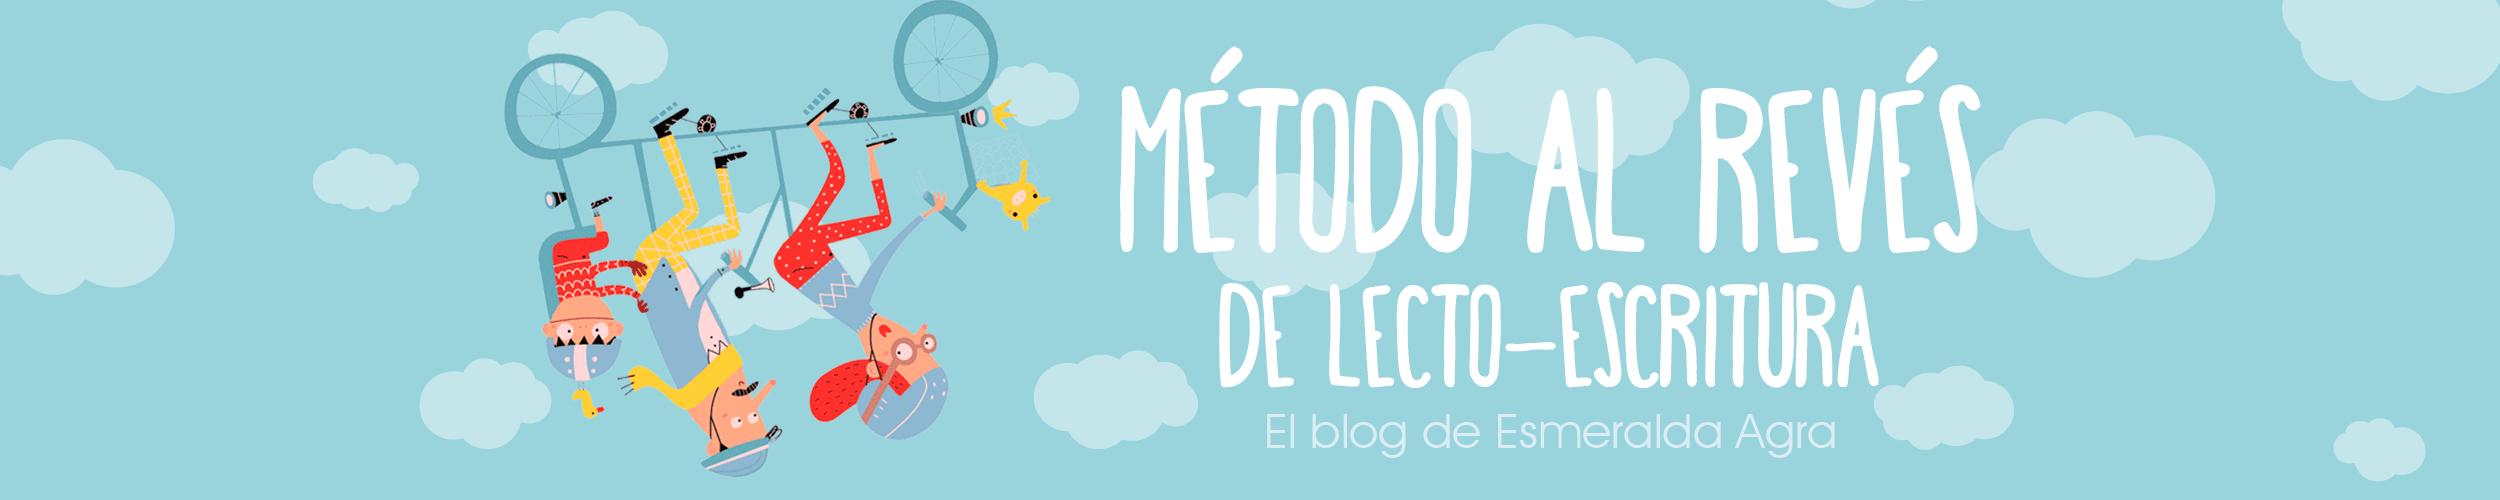 Método al revés de Lecto Escritura